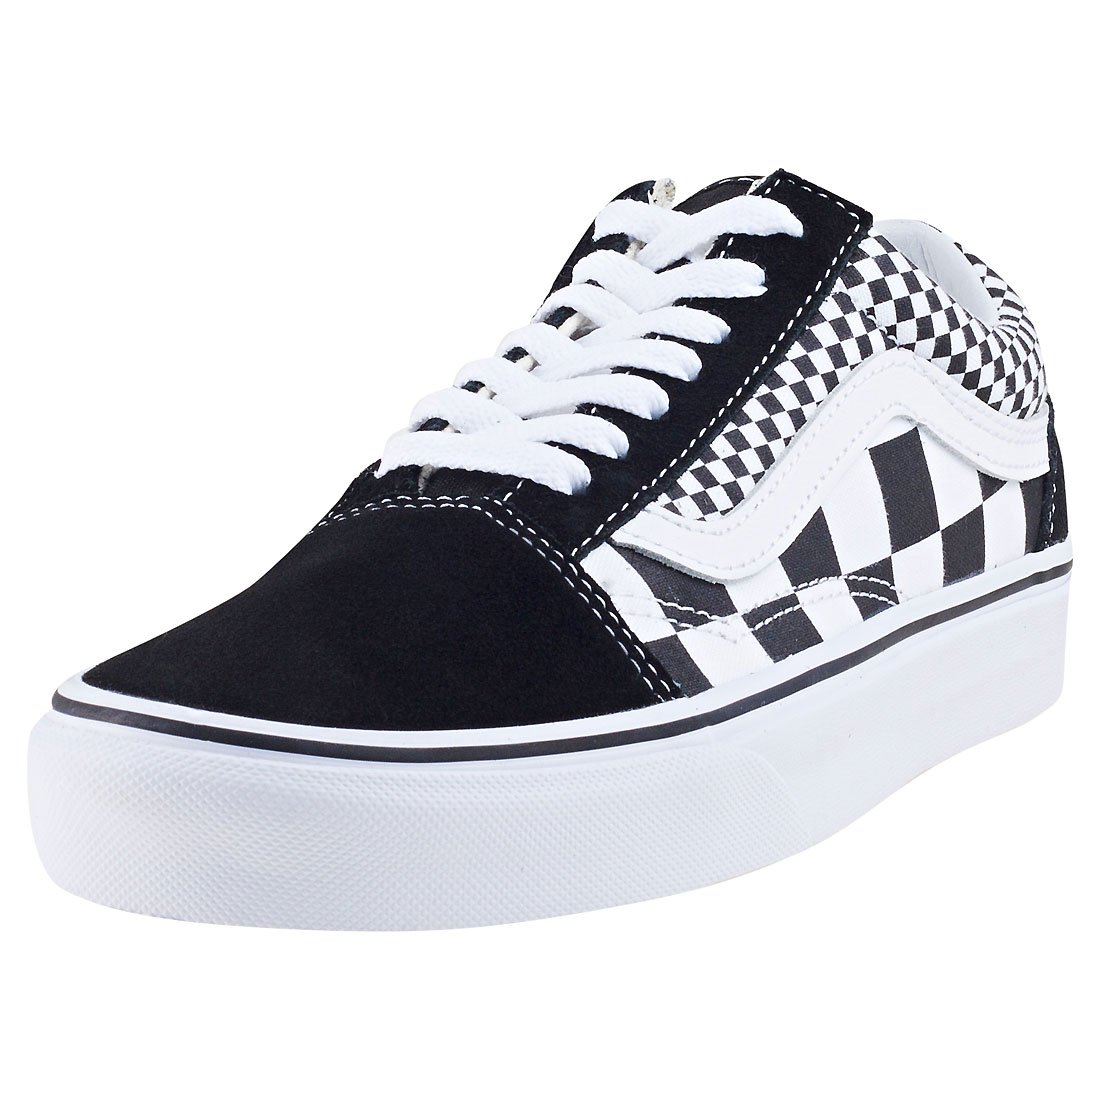 Vans Unisex Old Skool Skate Shoes Checkers/Black/True White 7.5 B(M) US Women/6 D(M) US Men